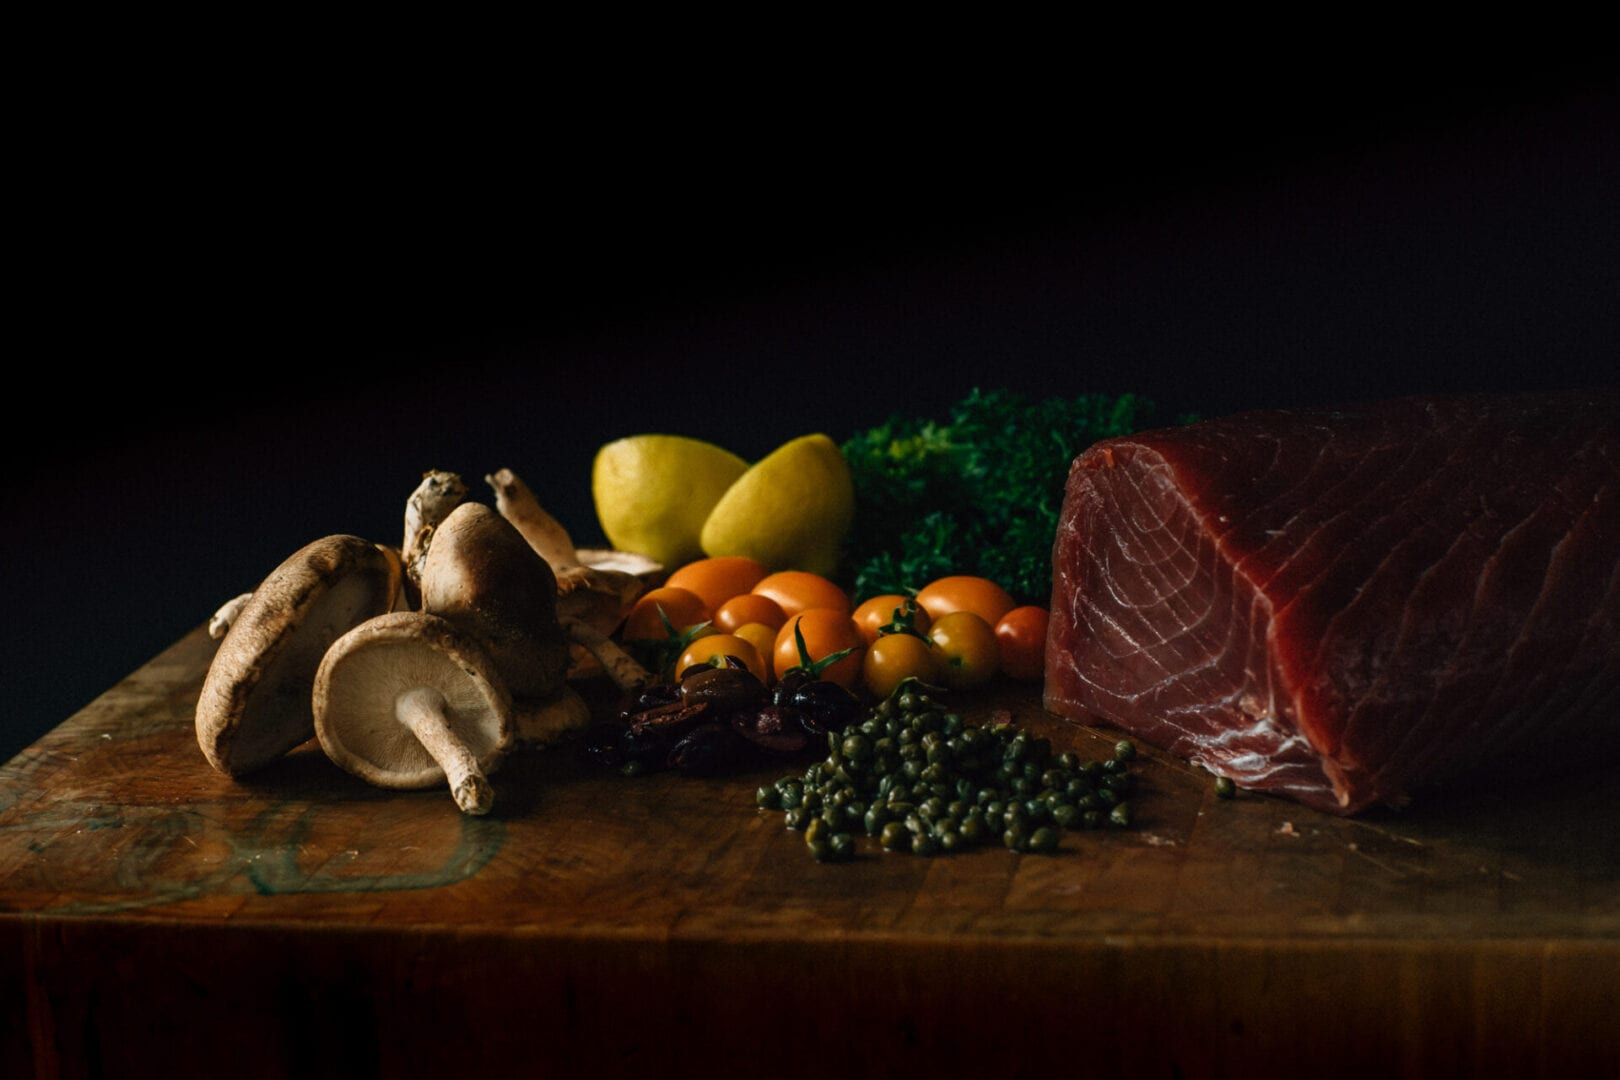 Delicious display of veggies and fresh tuna